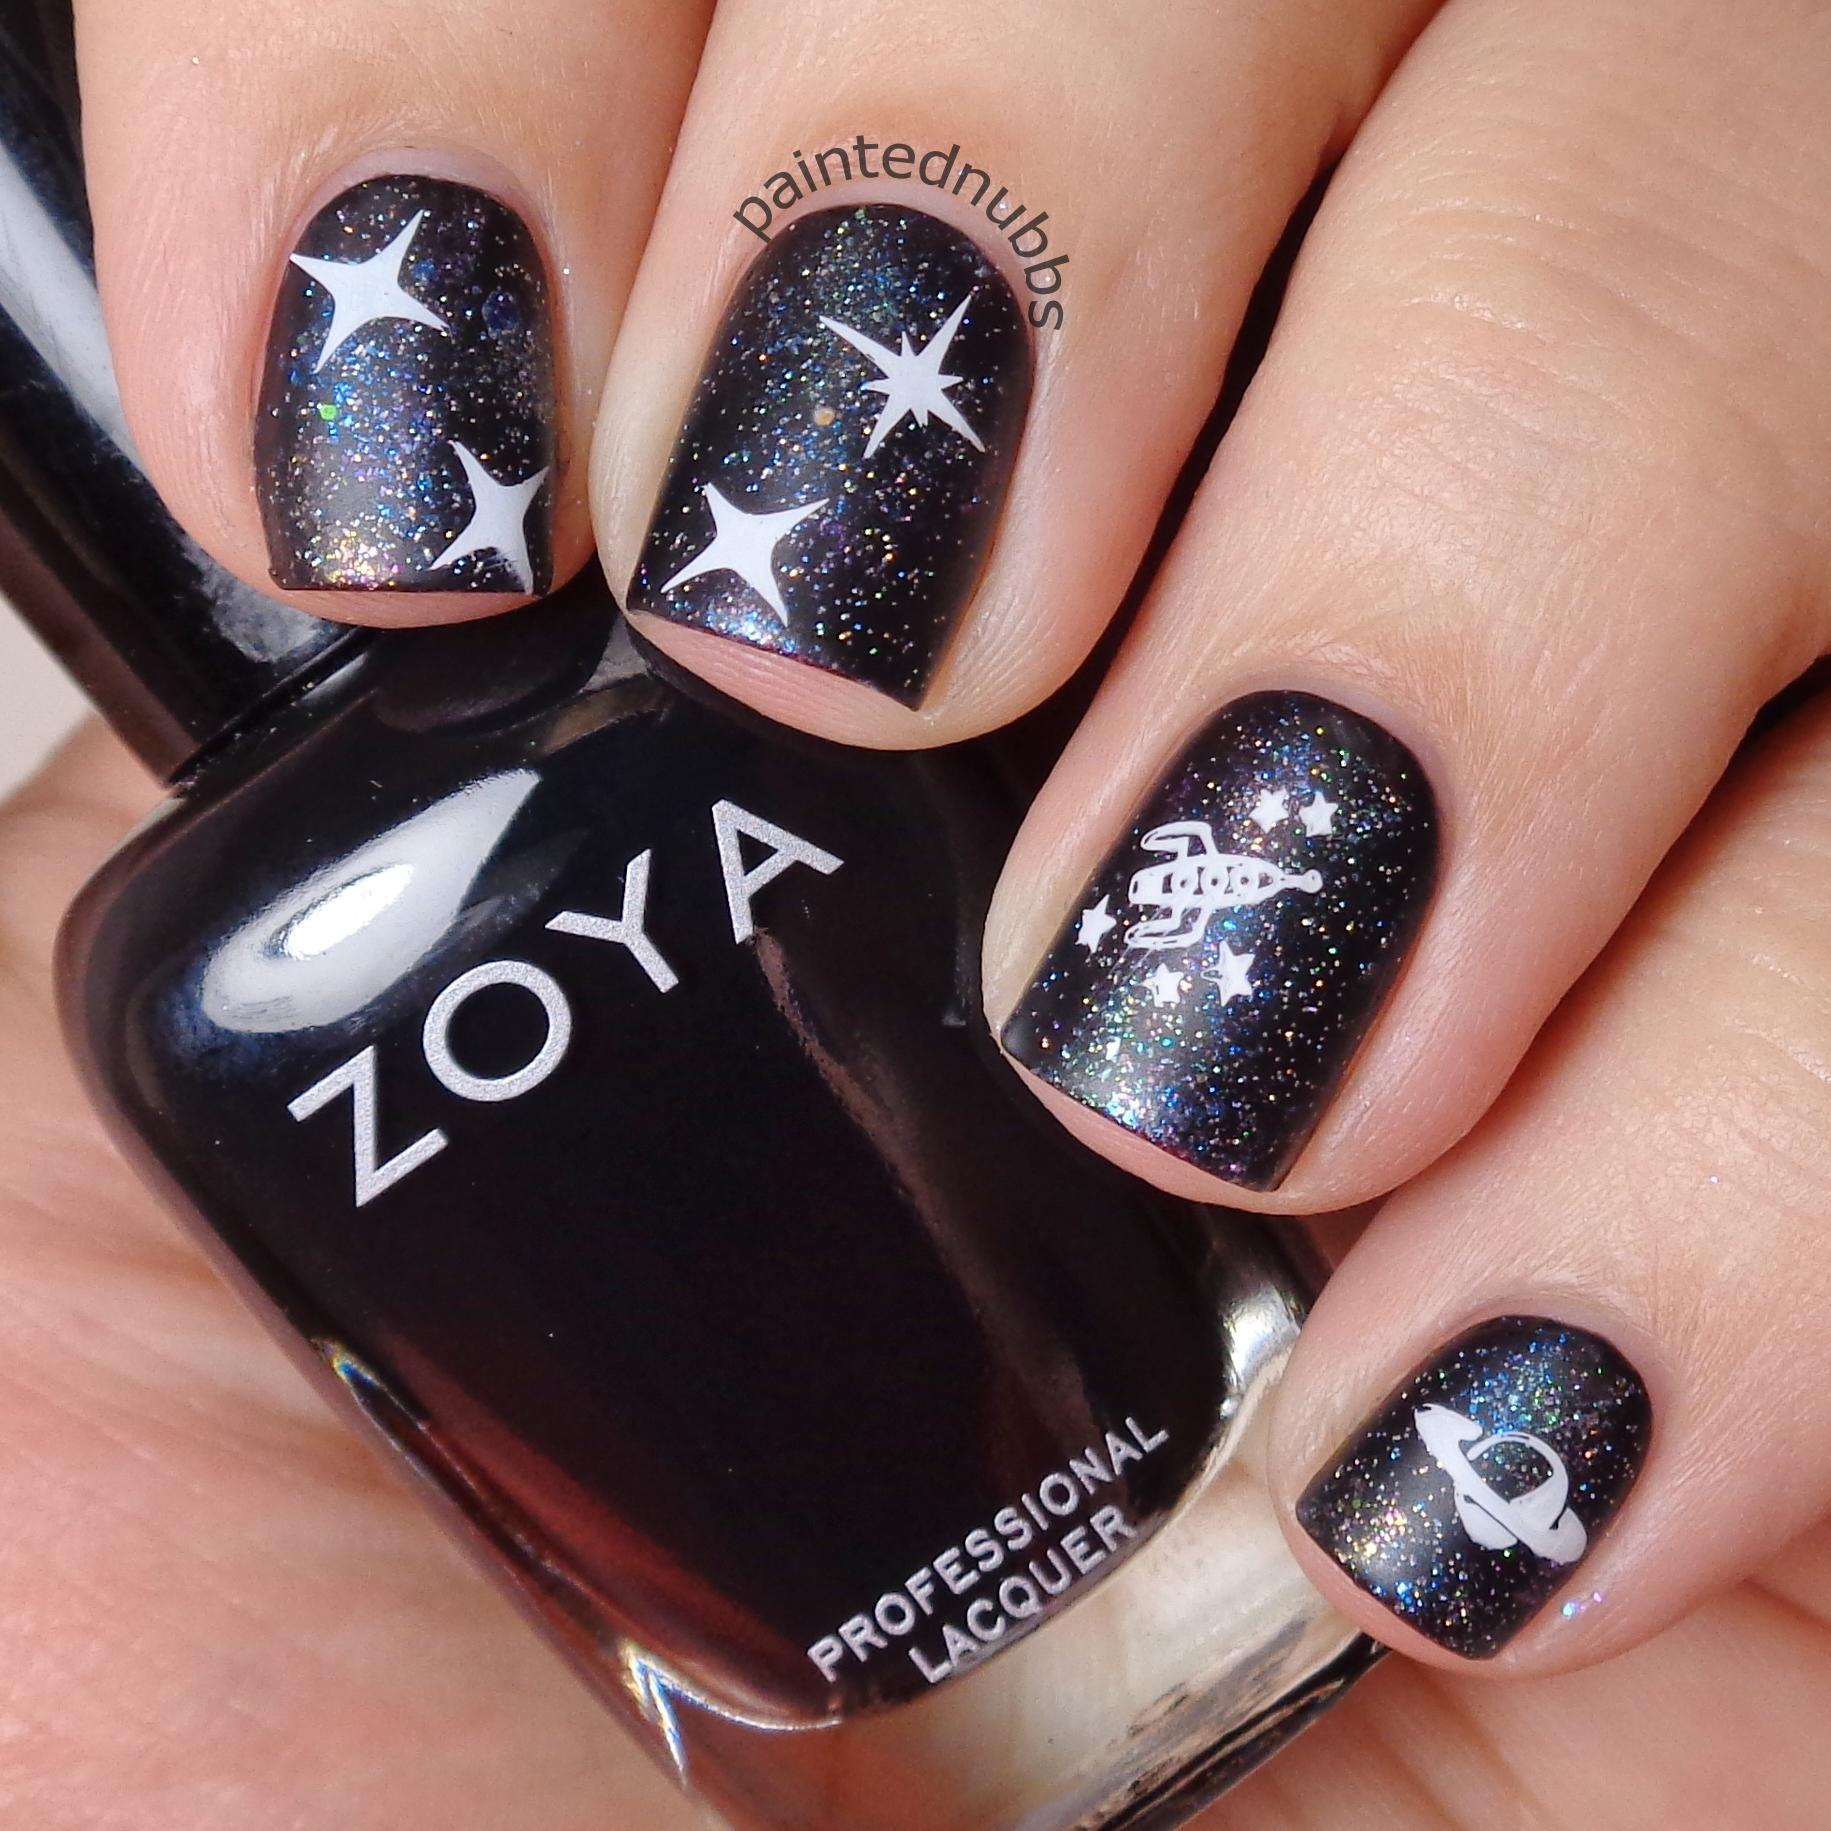 Winter Nail Polish: Custom Winter Interference Iridescent Glitter